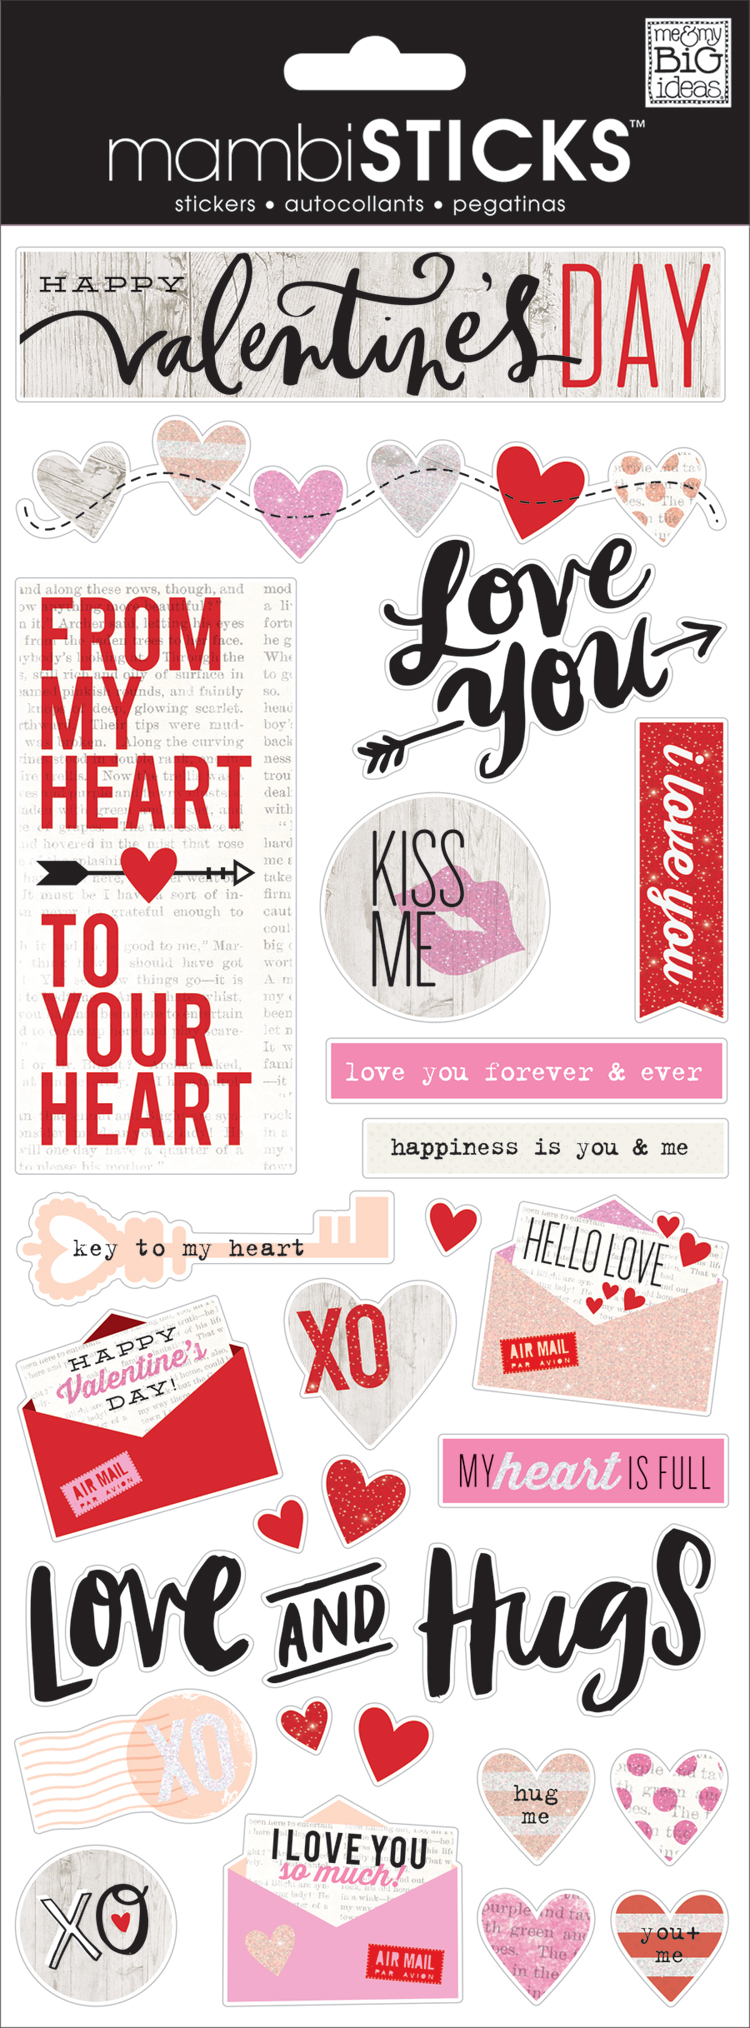 'Happy Valentine's Day' mambiSTICKS stickers   me & my BIG ideas.jpg